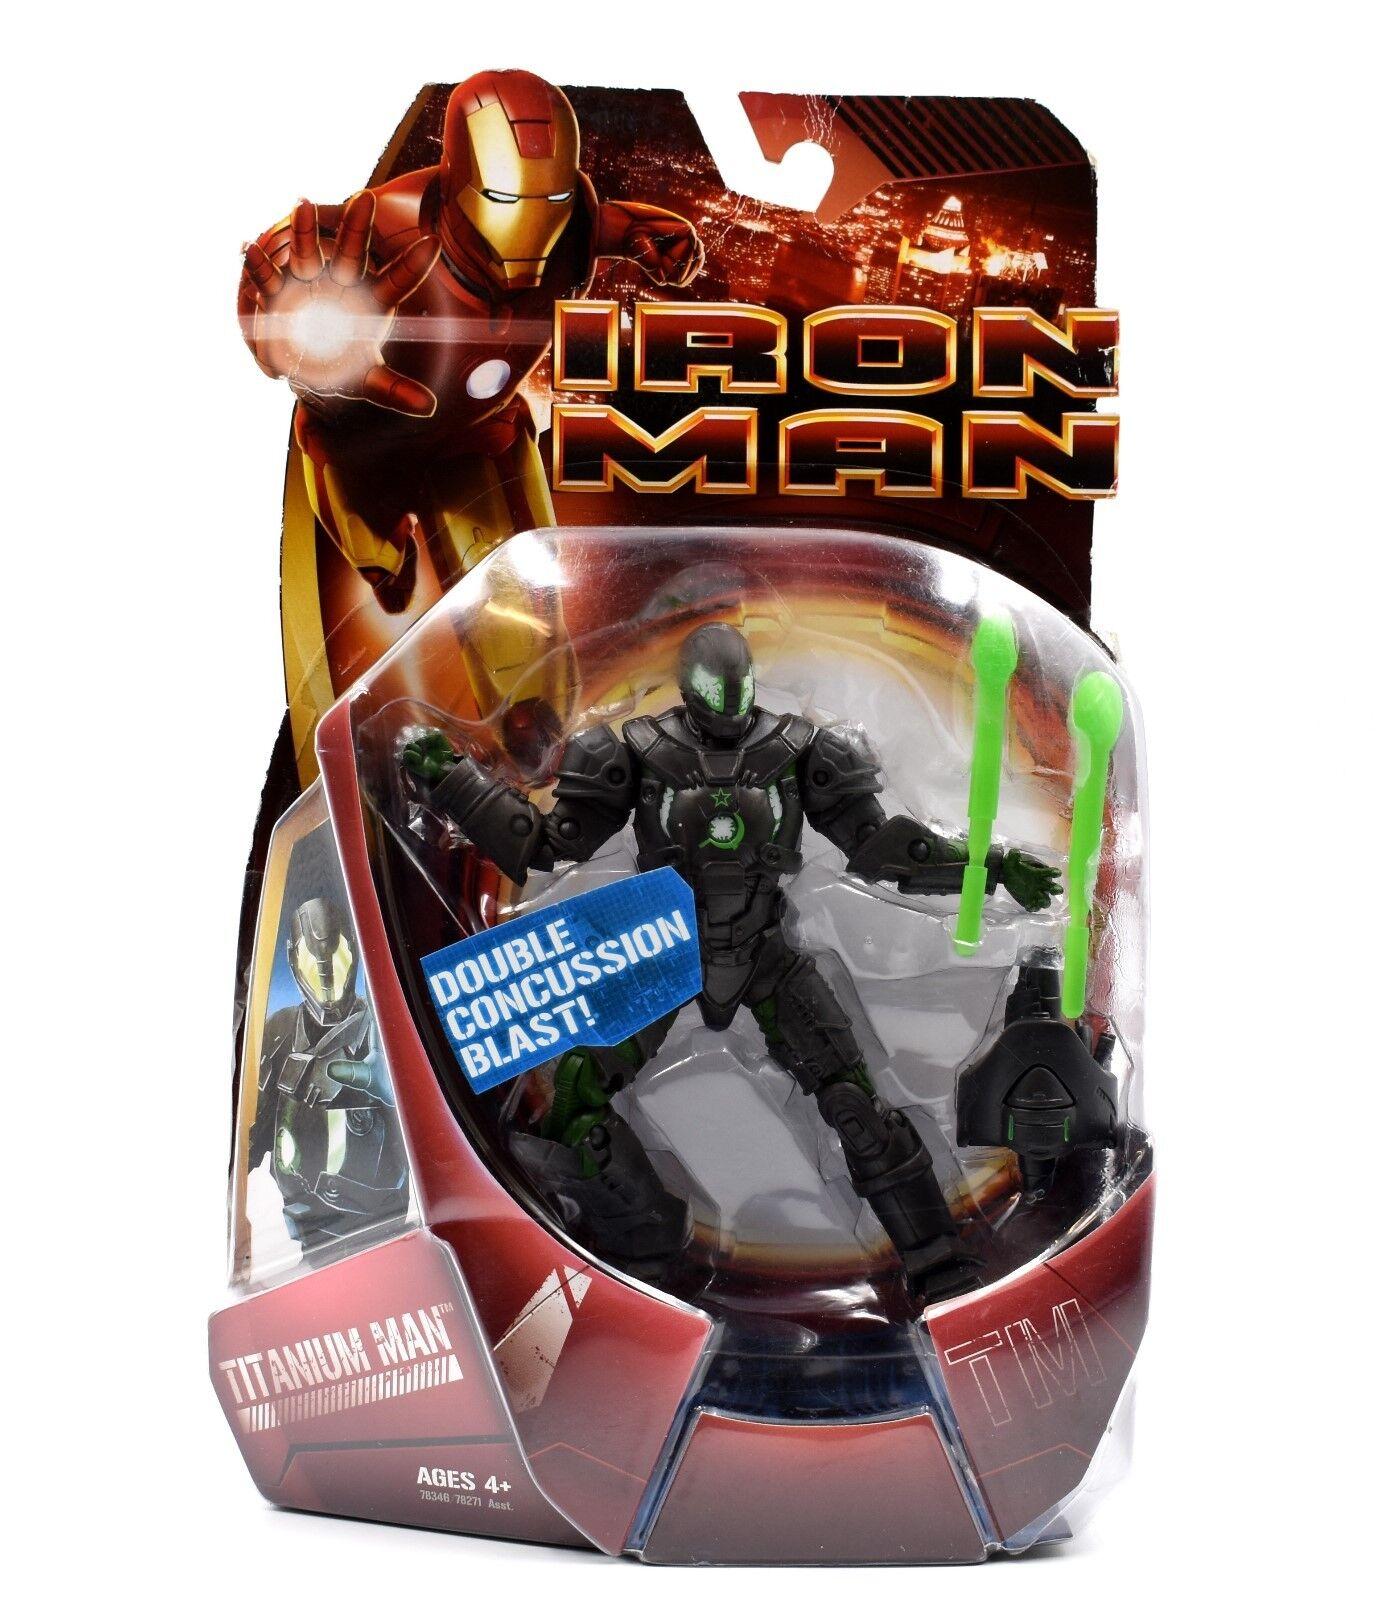 Iron Man Movie Series - Titanium Man Action Action Action Figure 6b2d37